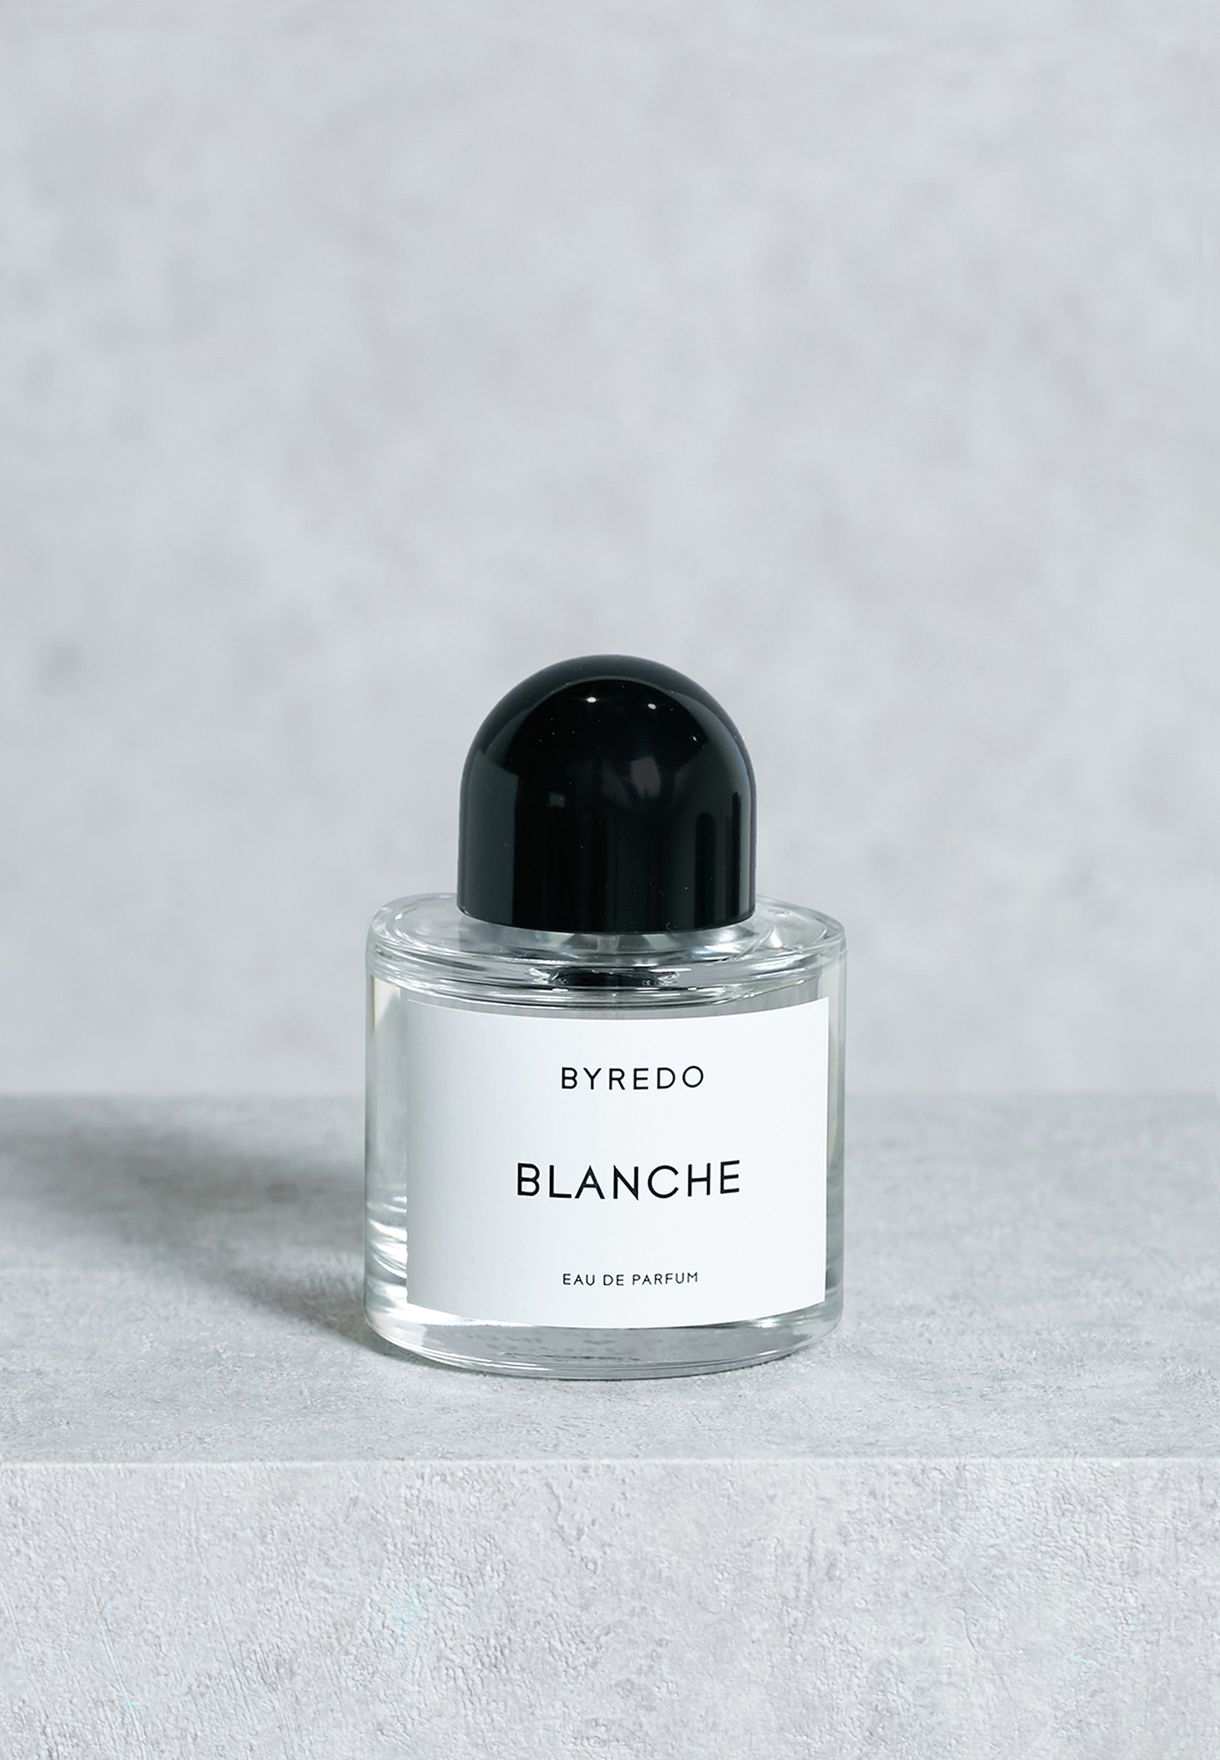 1b5680bc7 تسوق عطر بلانشي- 100 مل/ 3.4 اونصة ماركة بايريدو لون شفاف ...